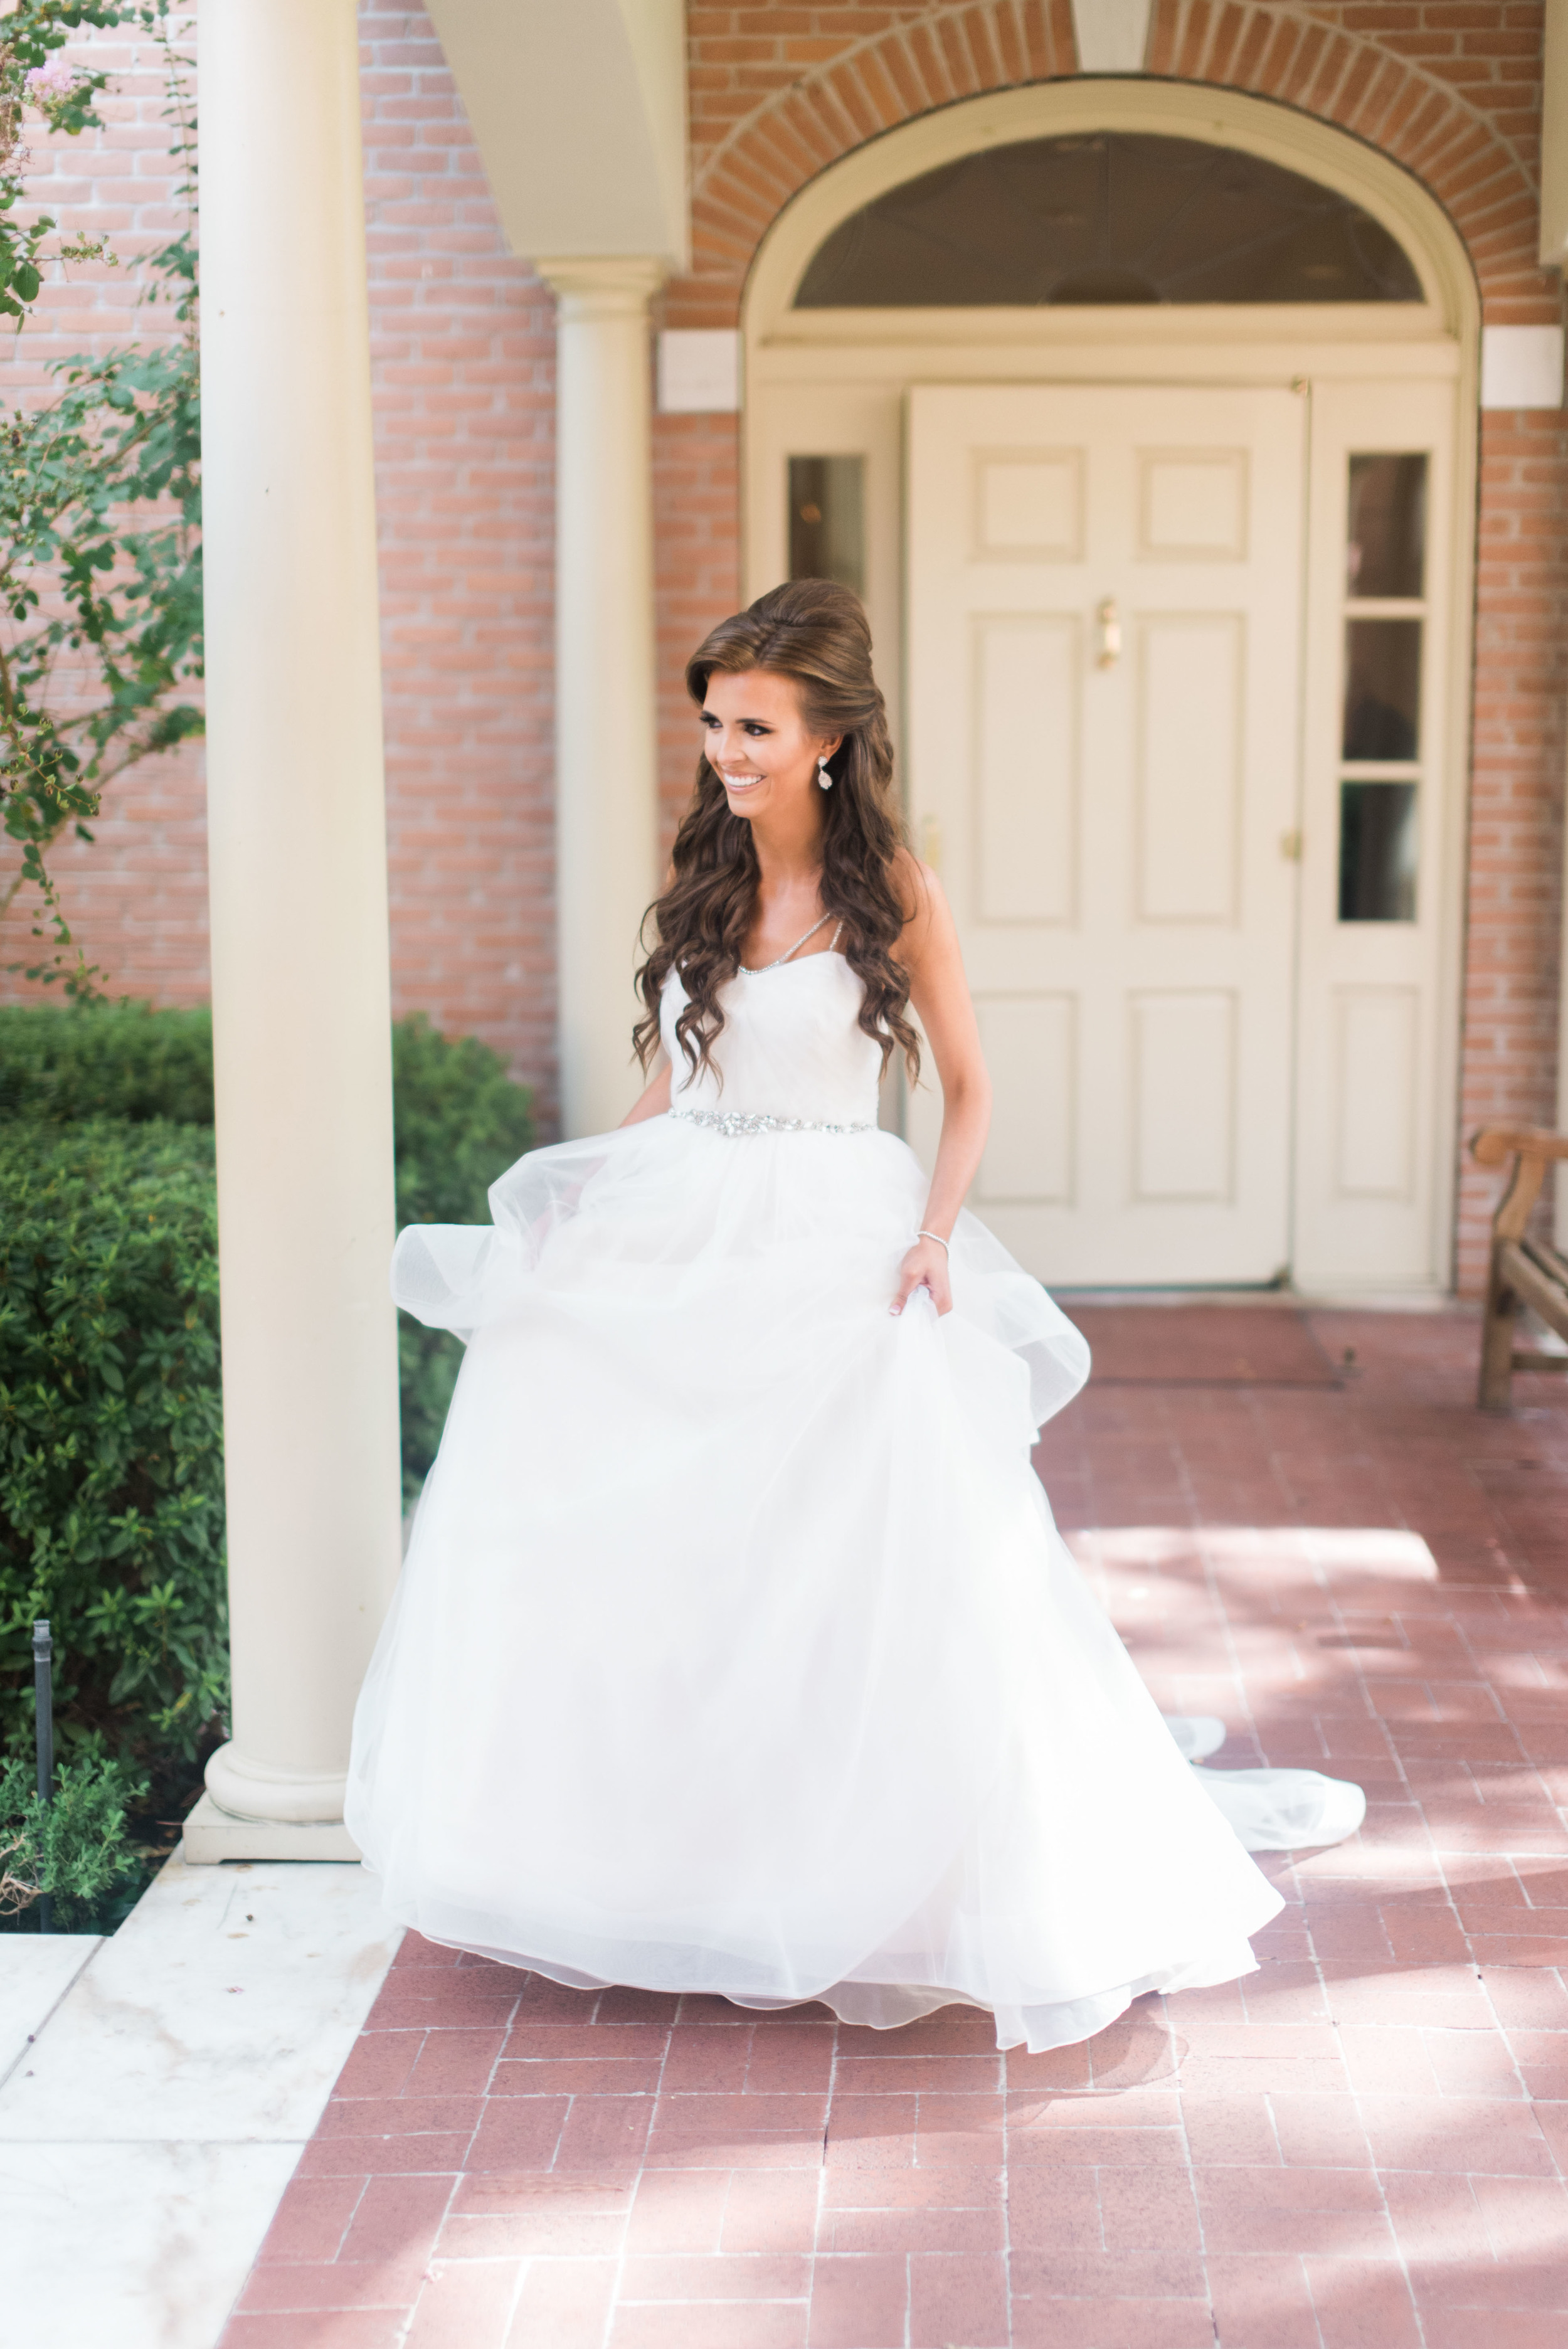 Dana-Fernandez-Photography-Weddings-in-Houston-Magazine-feature-Houston-wedding-photographer-film-22.jpg